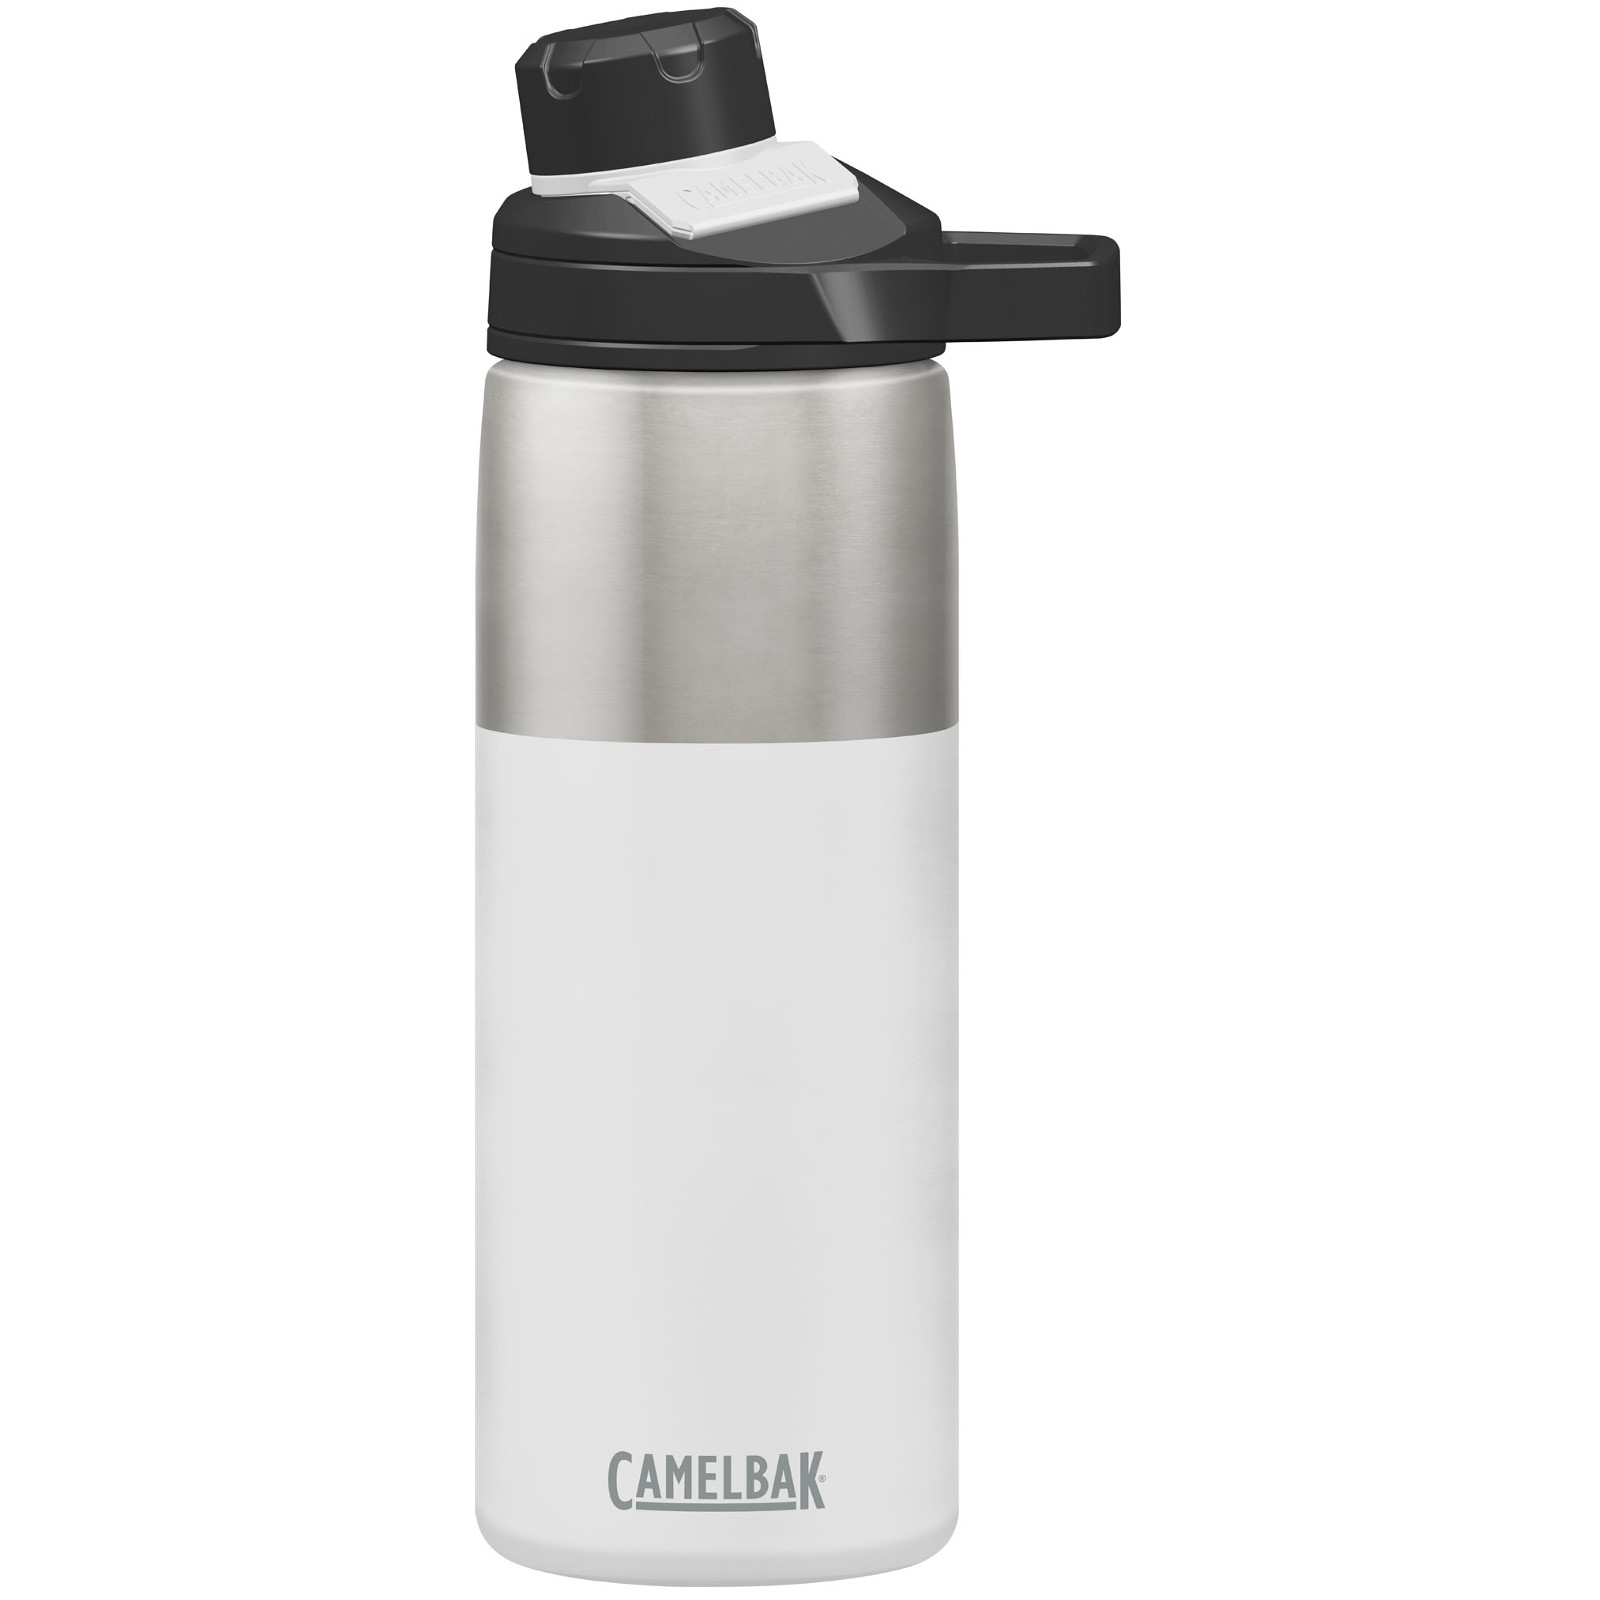 Camelbak Chute Mag Mag Mag isolation sous vide étanche Bouteille 20 Oz (environ 566.98 g)/0.6 L dee051